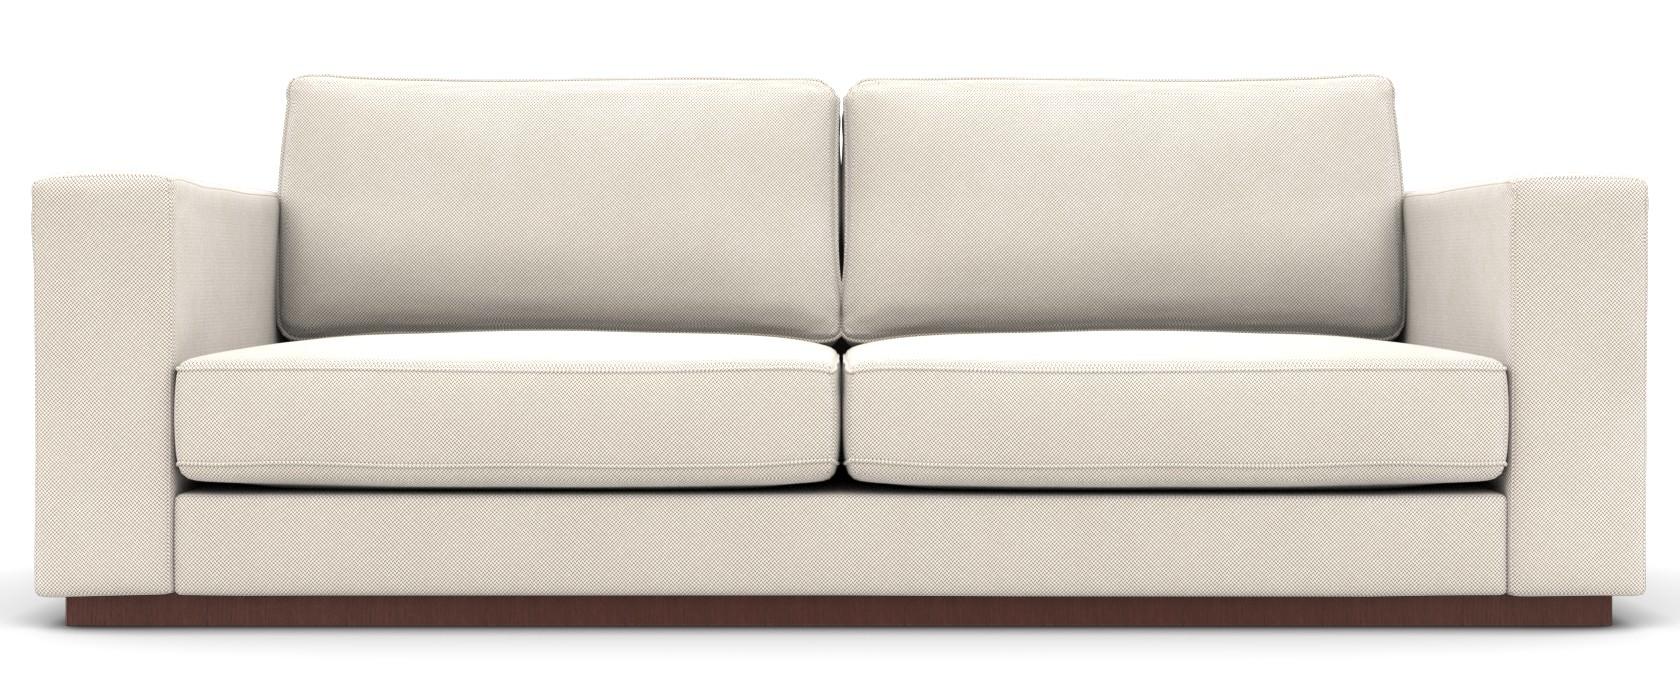 3-Sitzer Sofa Milano